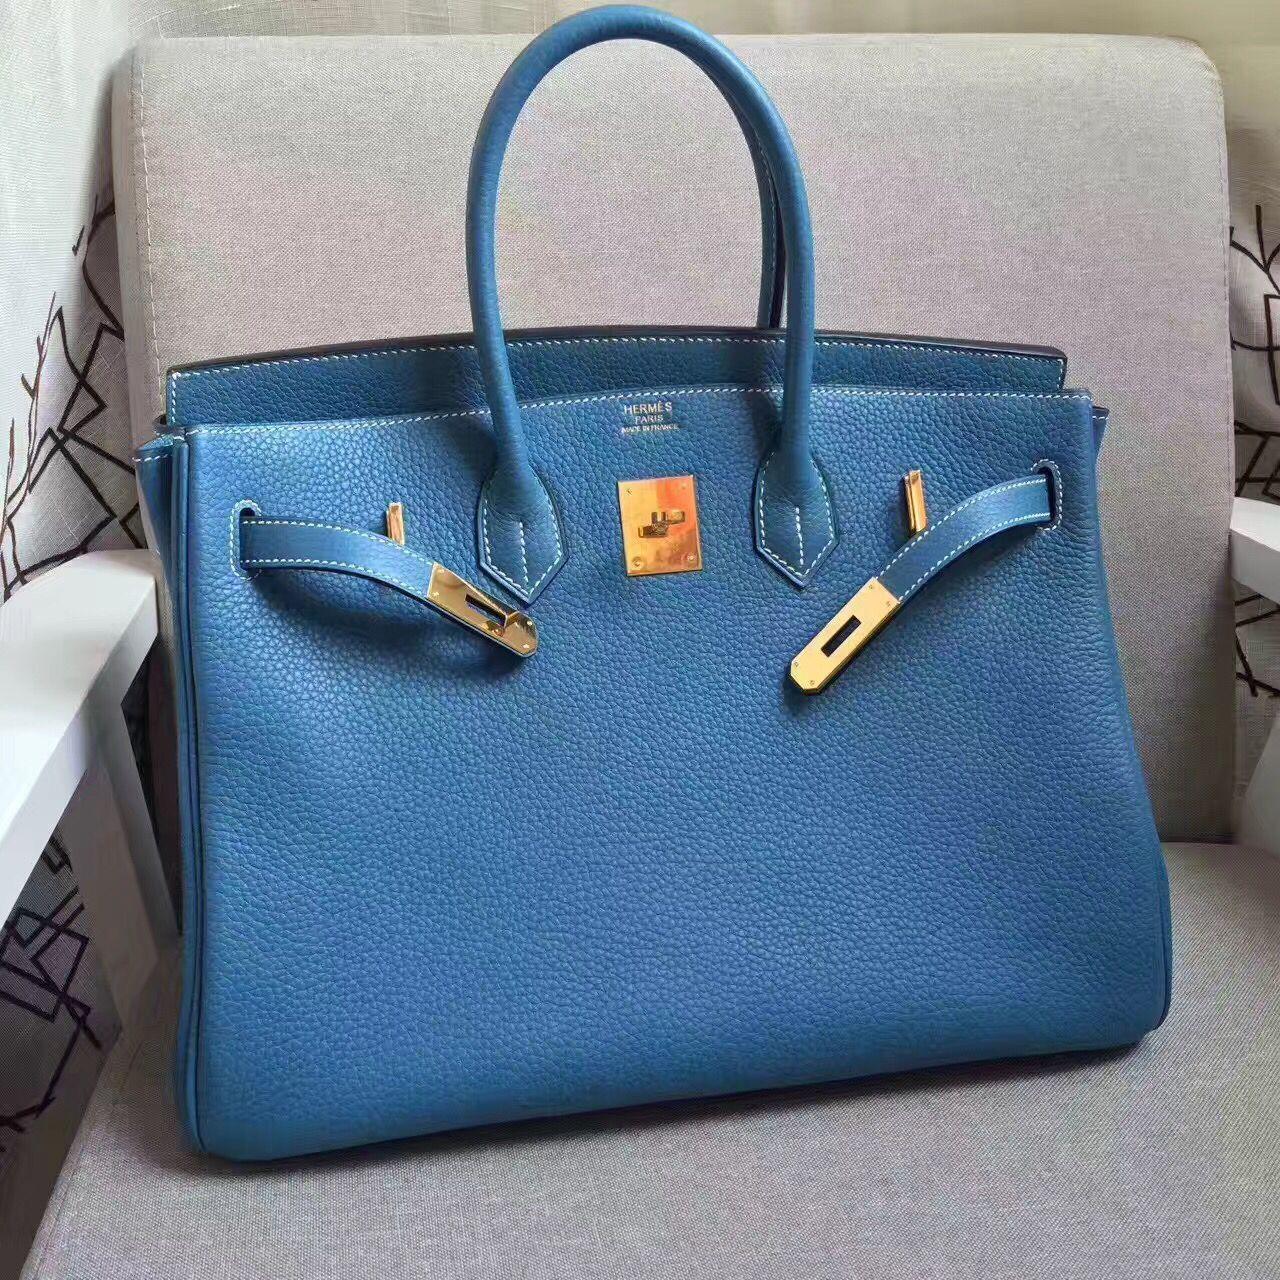 b181170a6bd Hermes Birkin 35cm cattle skin vein Handbags blue gold  RH0314 ...